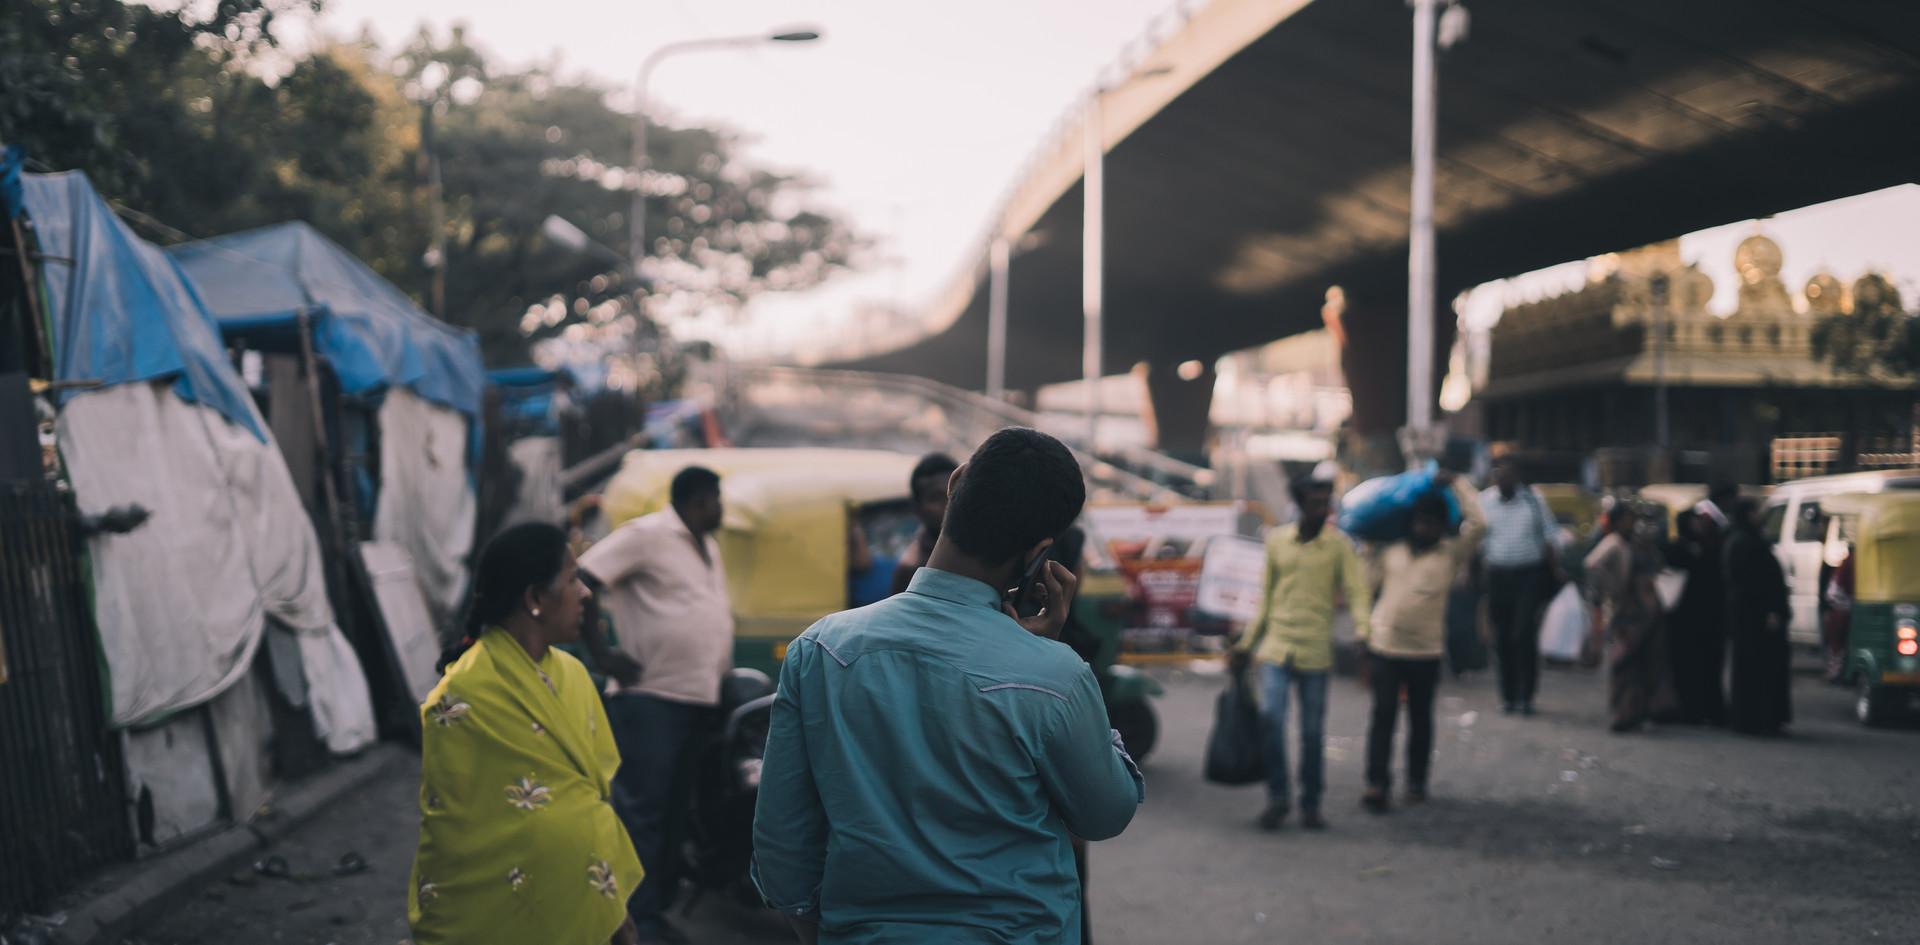 邦加羅爾 Bangalore, 印度 India